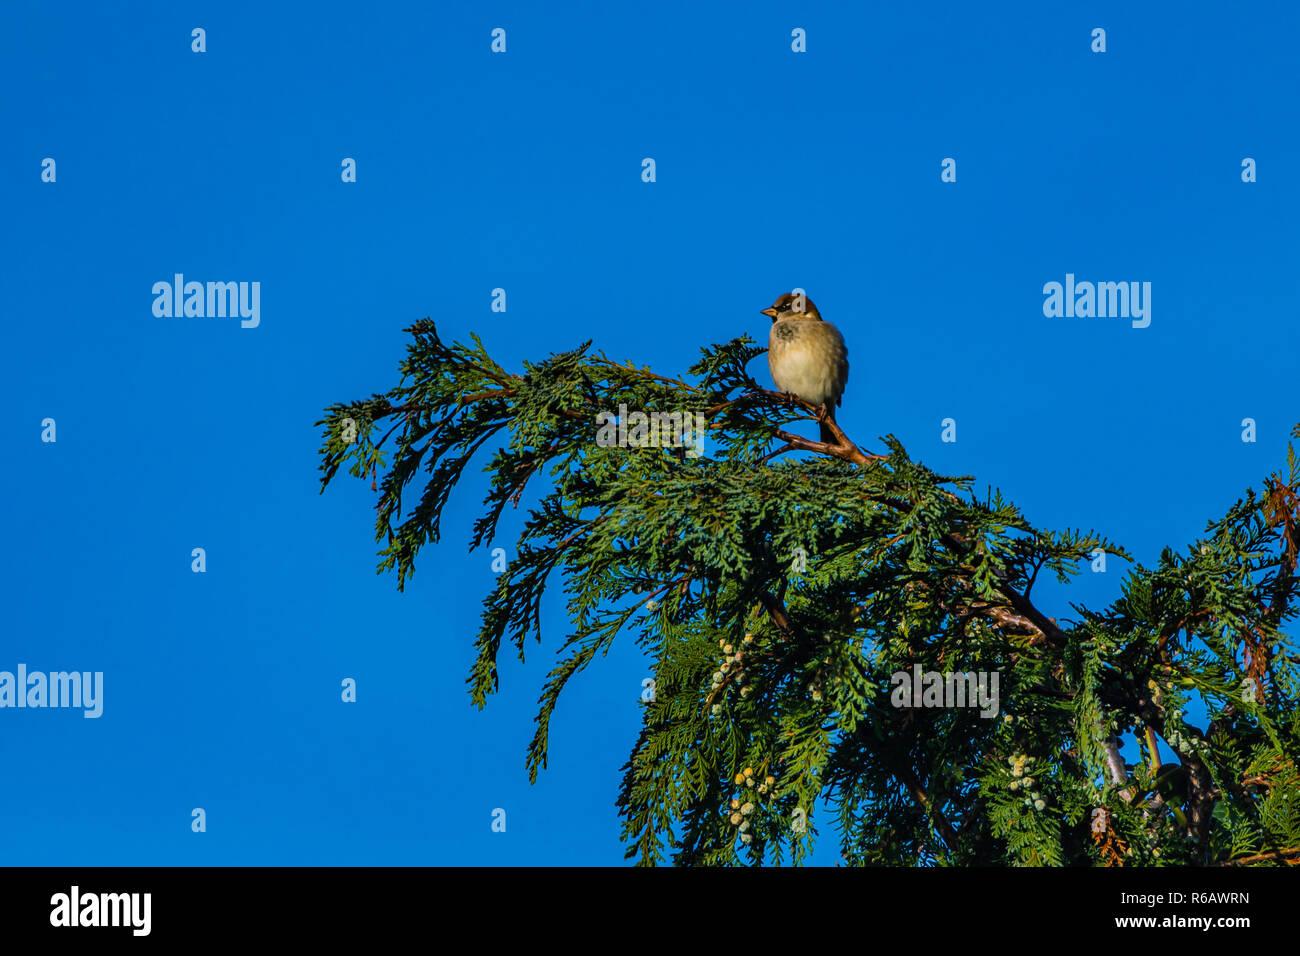 Goldfinch sitting on Thuja tree - Stock Image